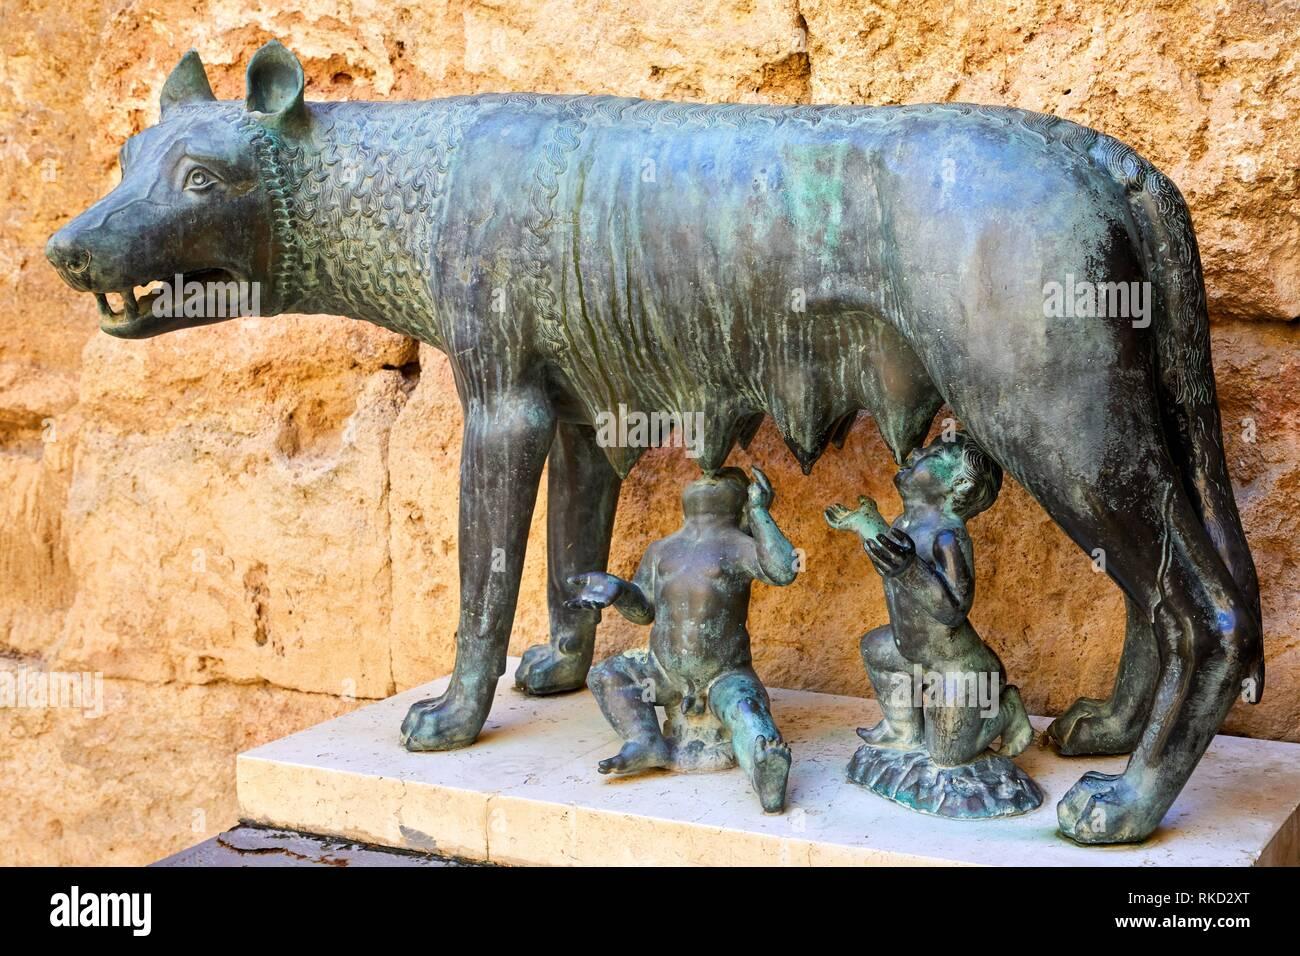 Augustus Palace, Rome Symbol, The wolf and Romulus and Remus, Praetorium and Roman Circus, History Museum of Tarragona (MHT), Tarragona City, - Stock Image